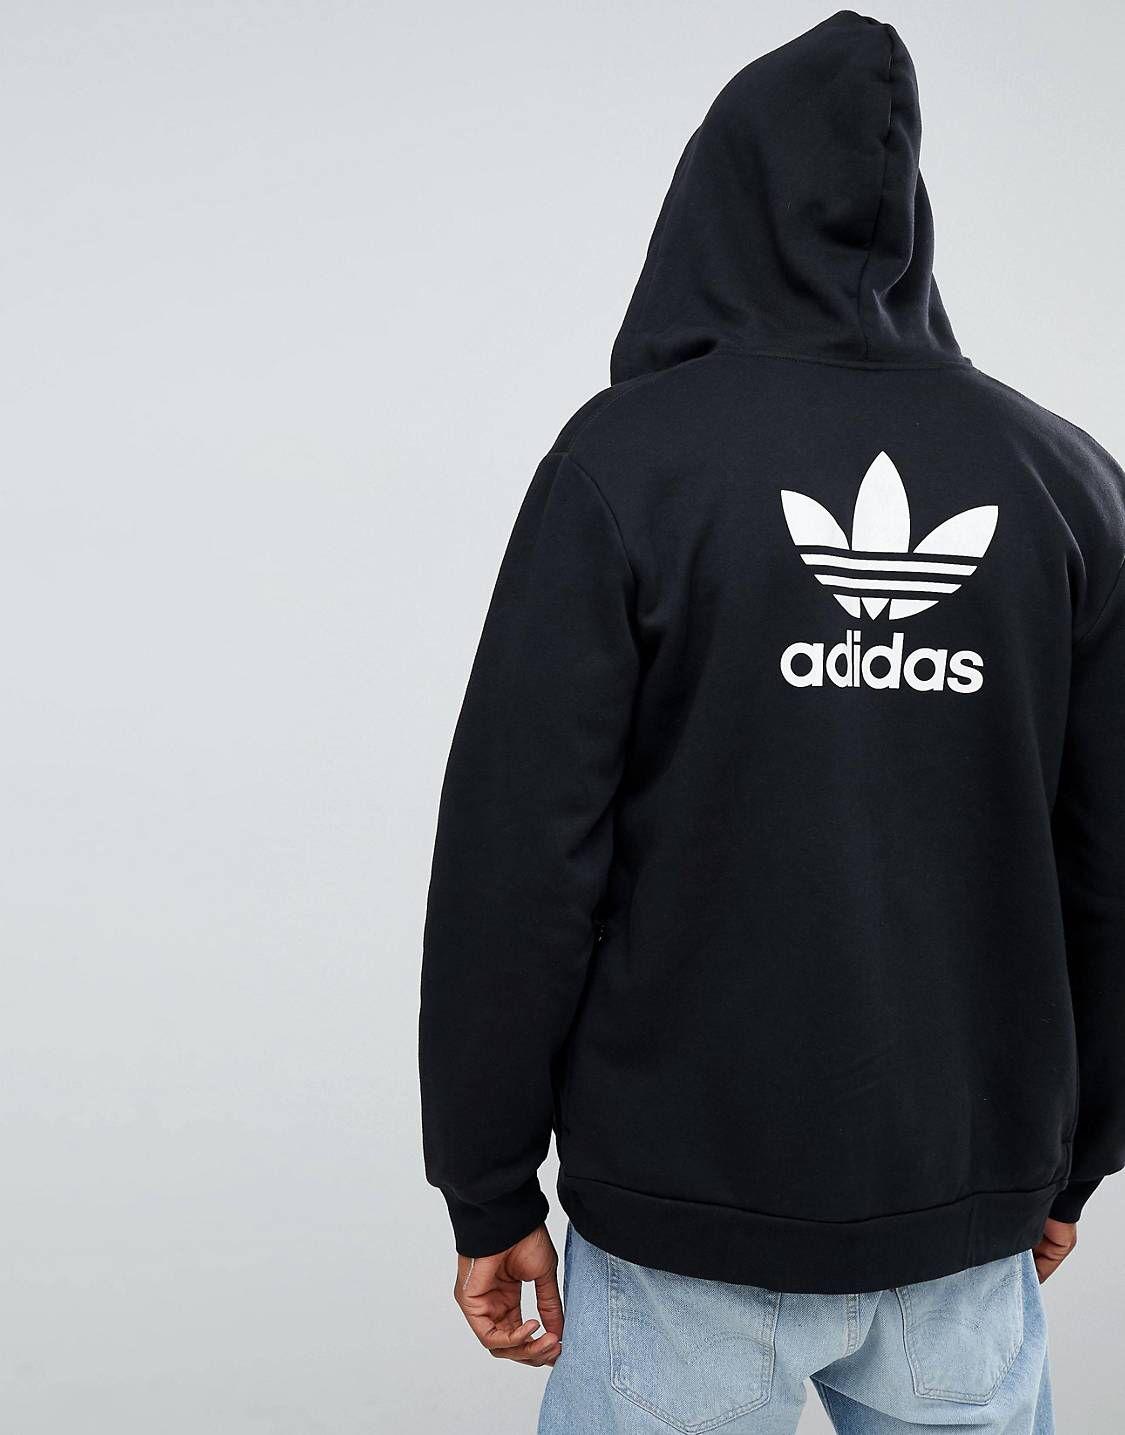 Adidas Originals Zip Thru Sweatshirt